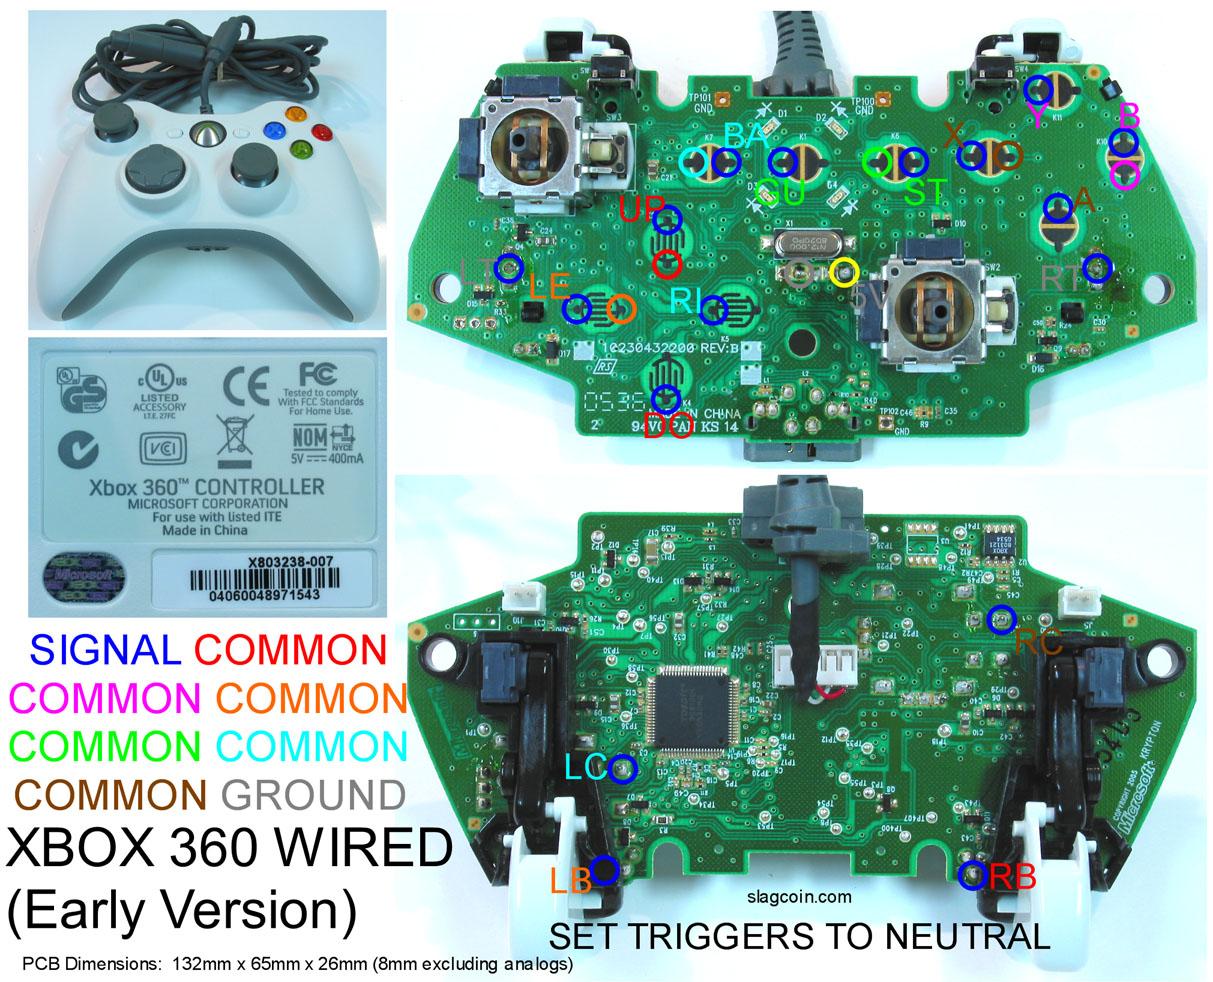 Xbox 360 wireless controller wiring diagram,wireless free download xbox wiring diagrams xbox diy wiring diagrams, Xbox 1 Wiring Diagram